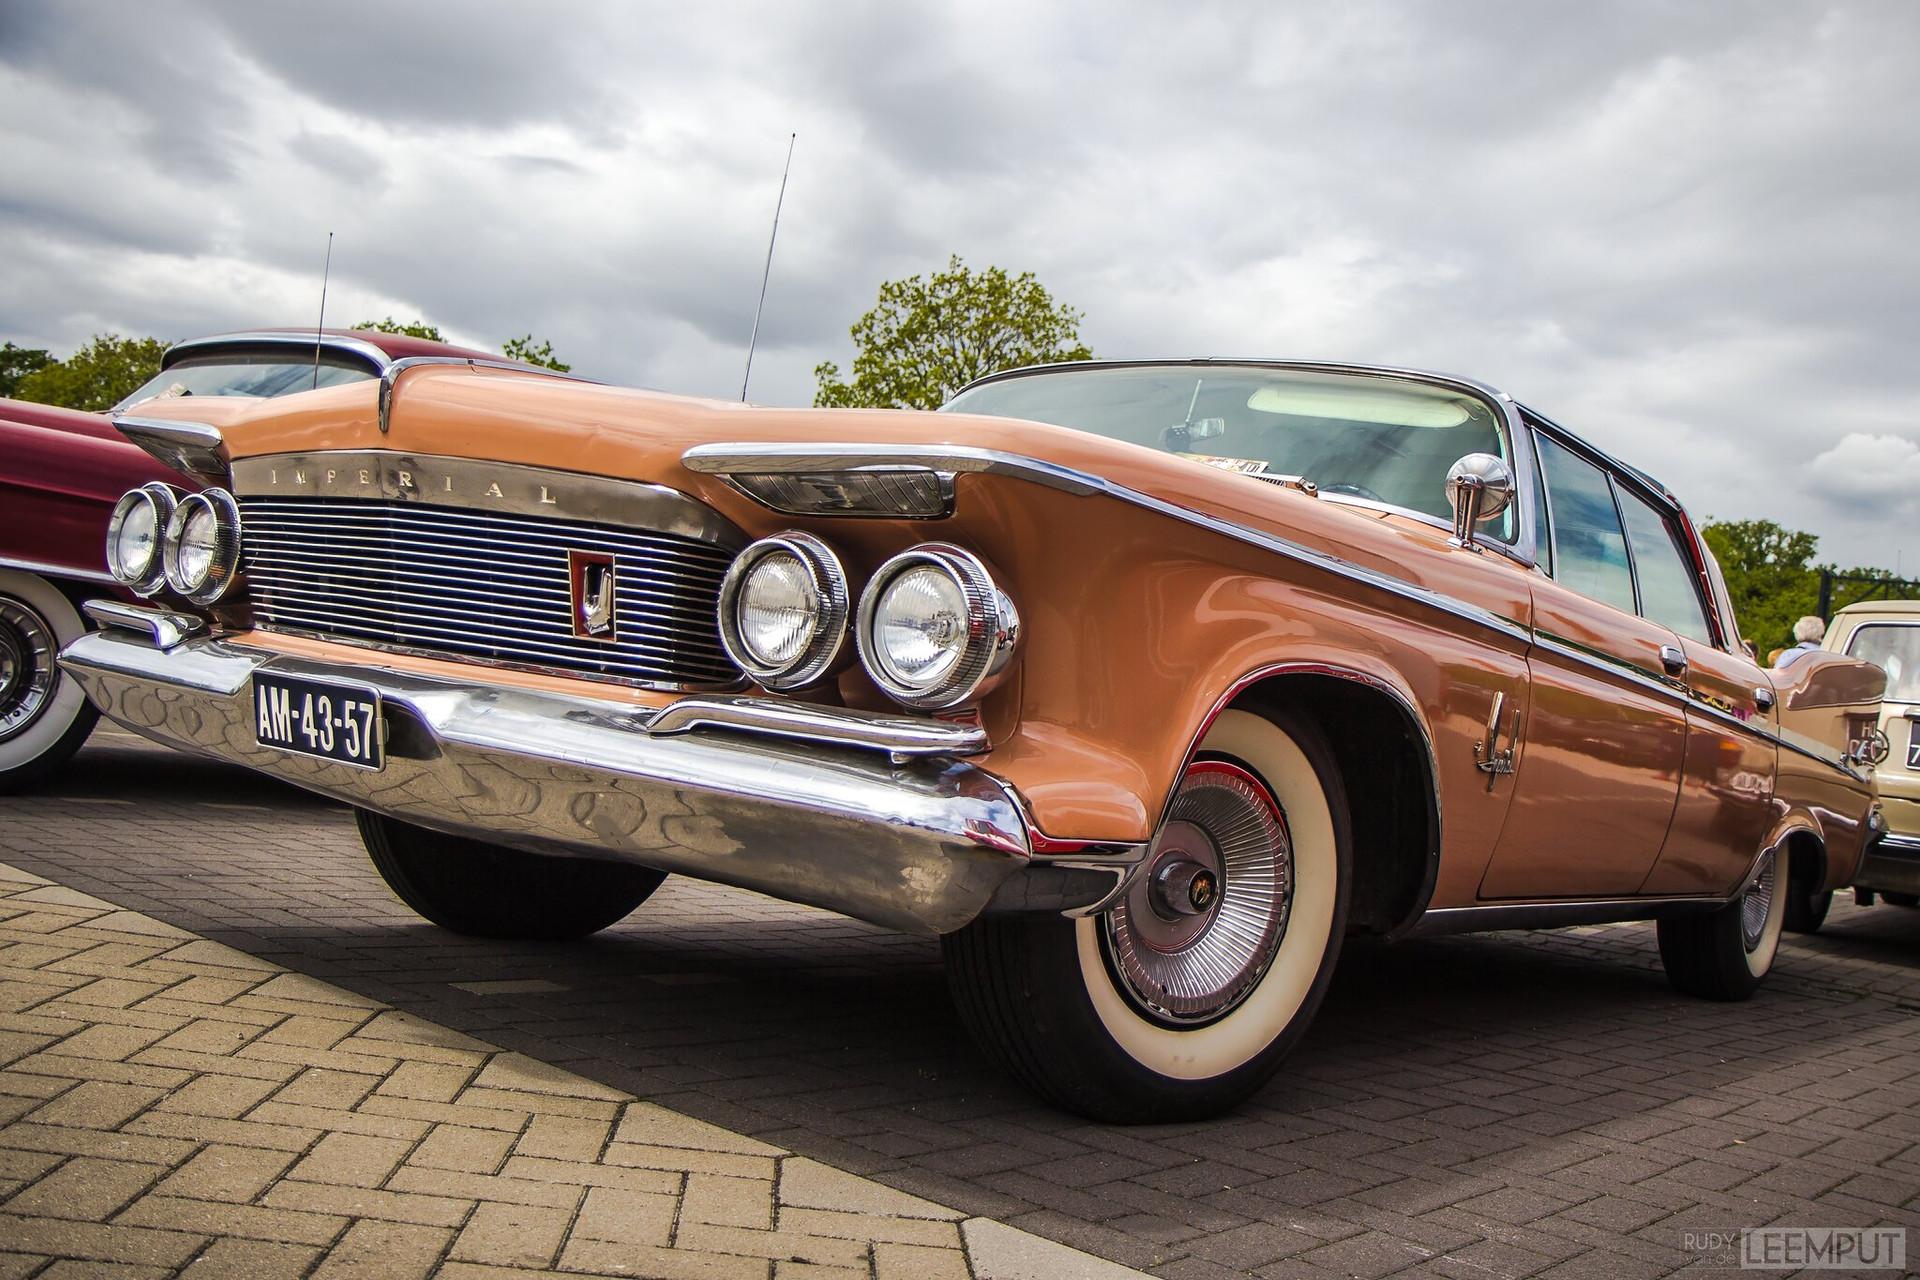 1961 | AM-43-57 | Chrysler Imperial